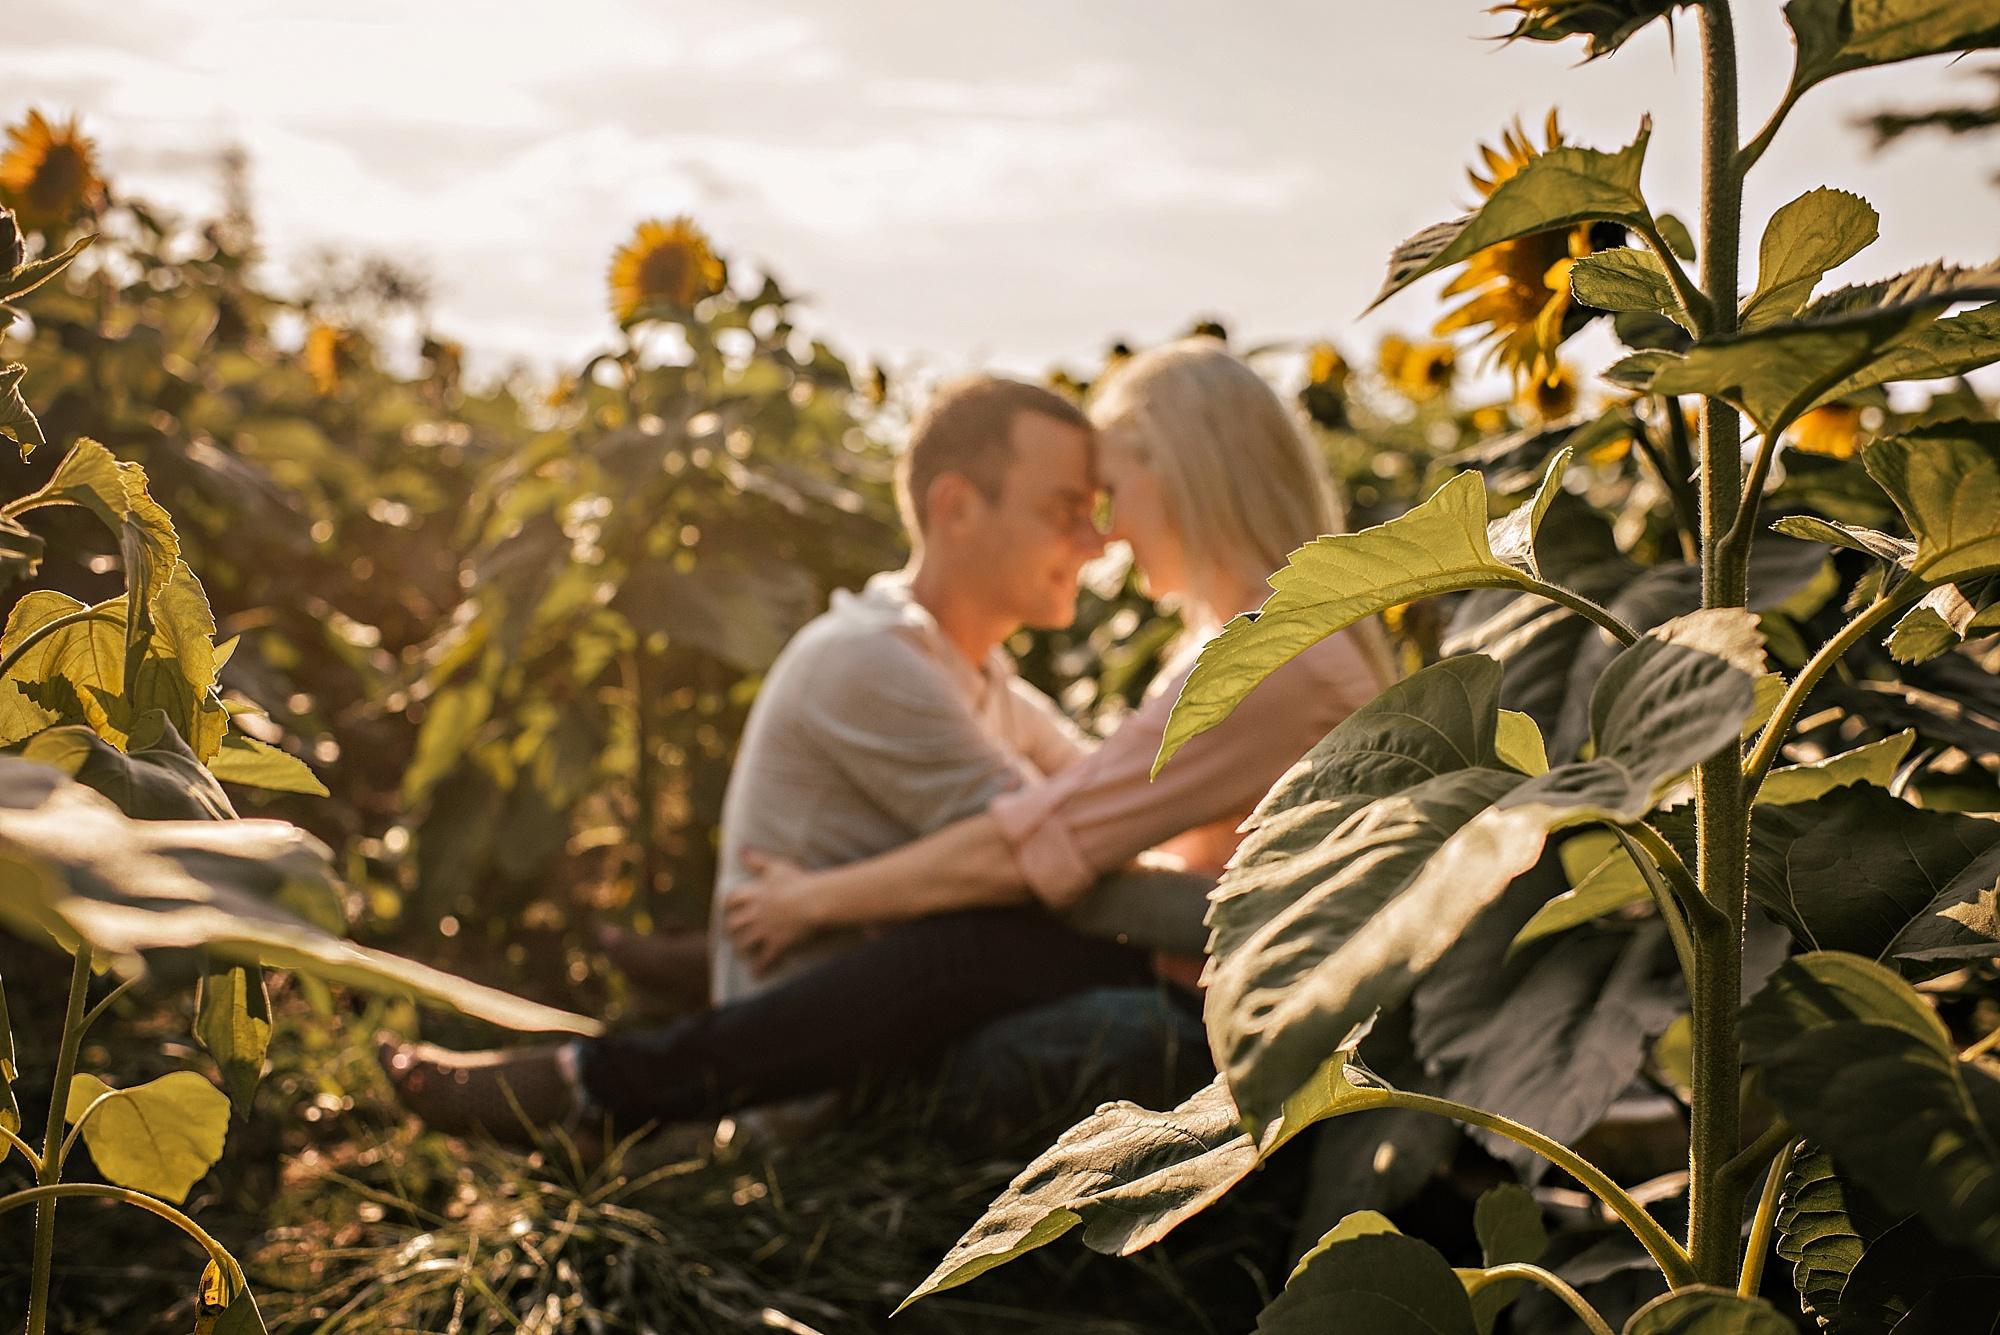 Lori-and-mike-akron-ohio-photographer-lauren-grayson-sunflower-field-session_0015.jpg